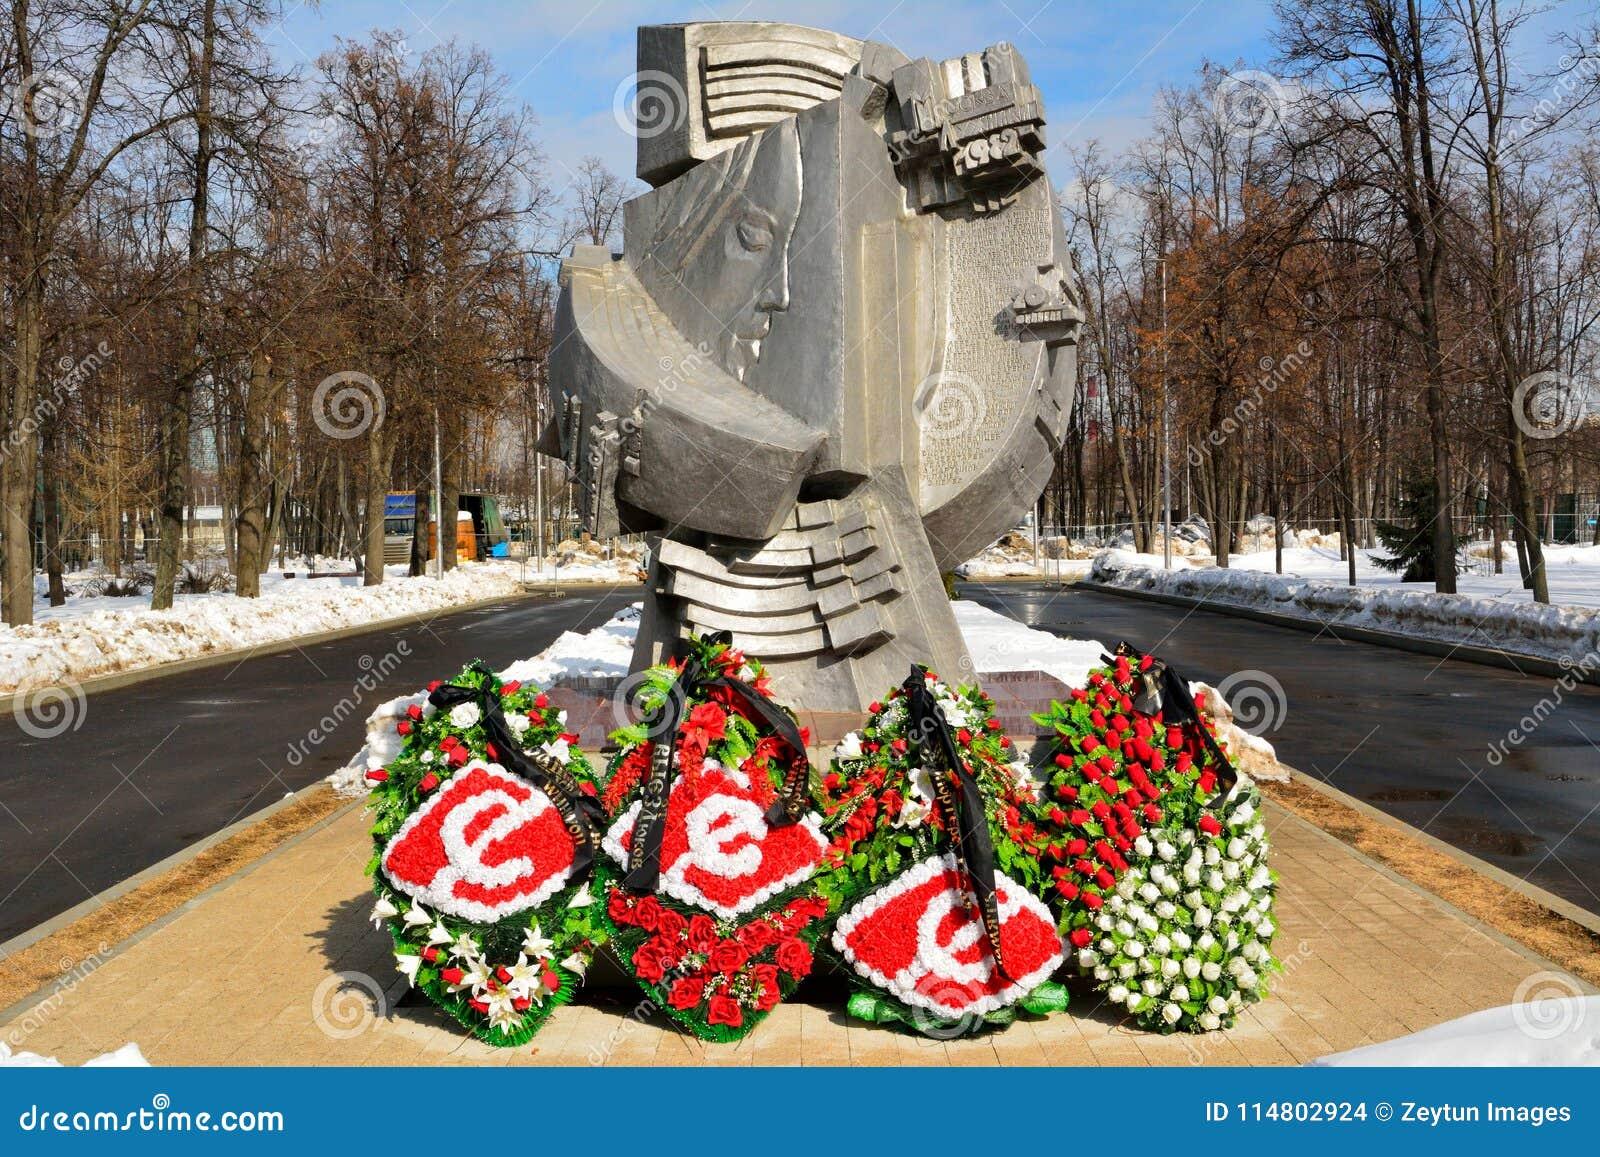 Monumento cerca del estadio de Luzhniki en Moscú